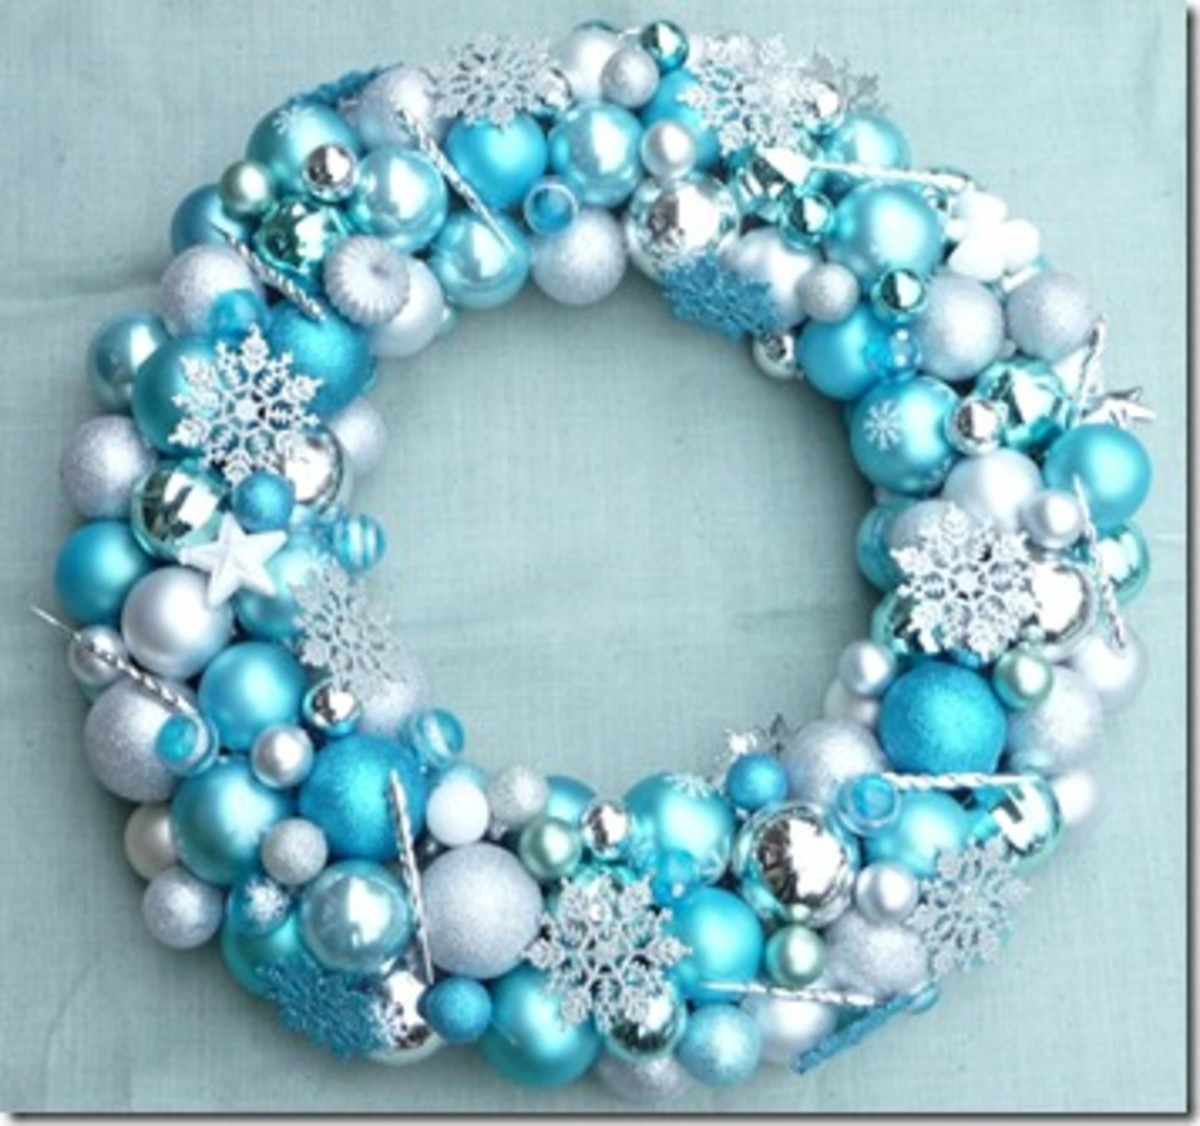 How to Make a Christmas Ornament Wreath | Holidappy